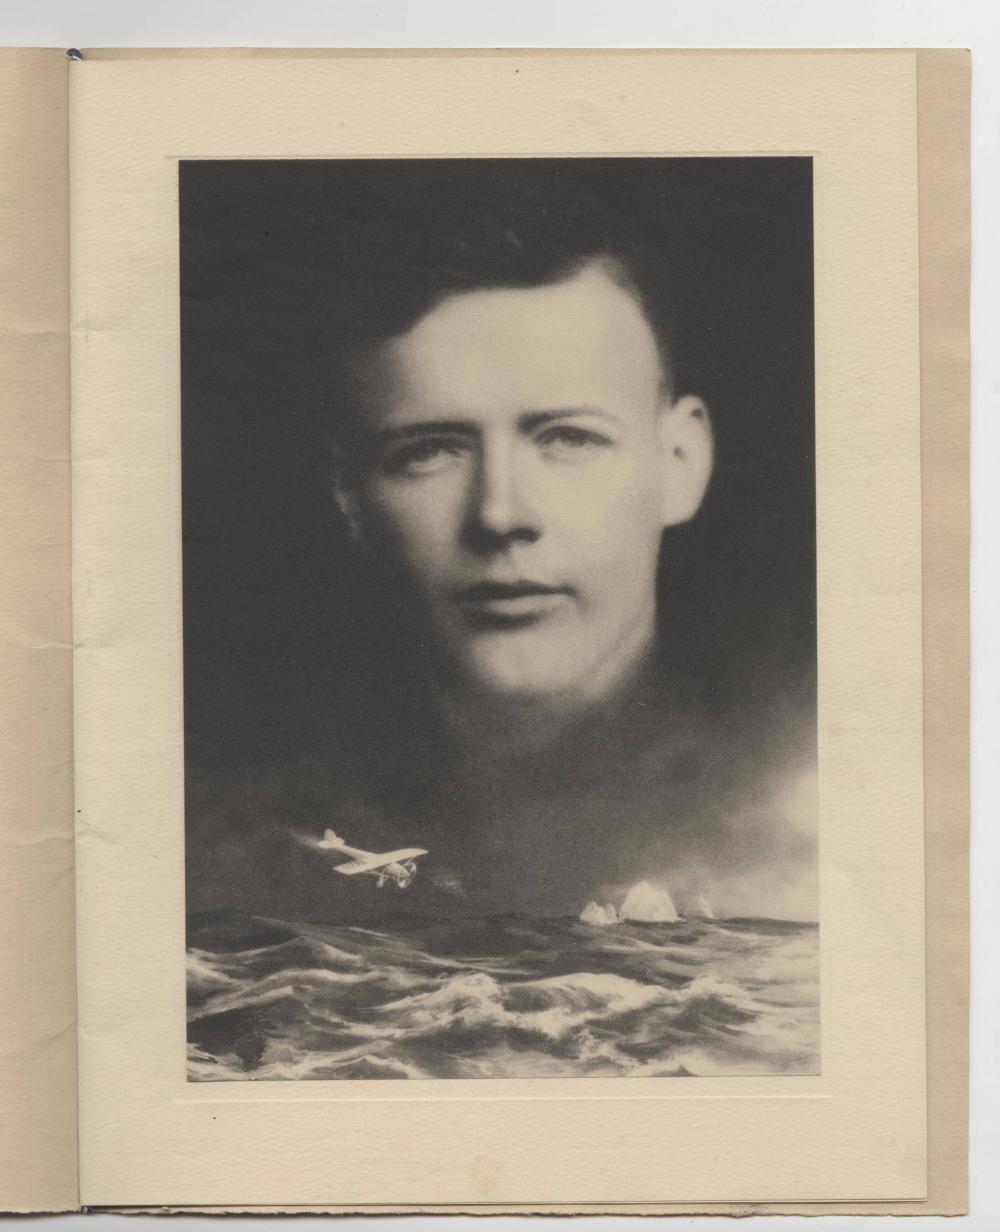 Charles Lindbergh Program Commemorating his Flight